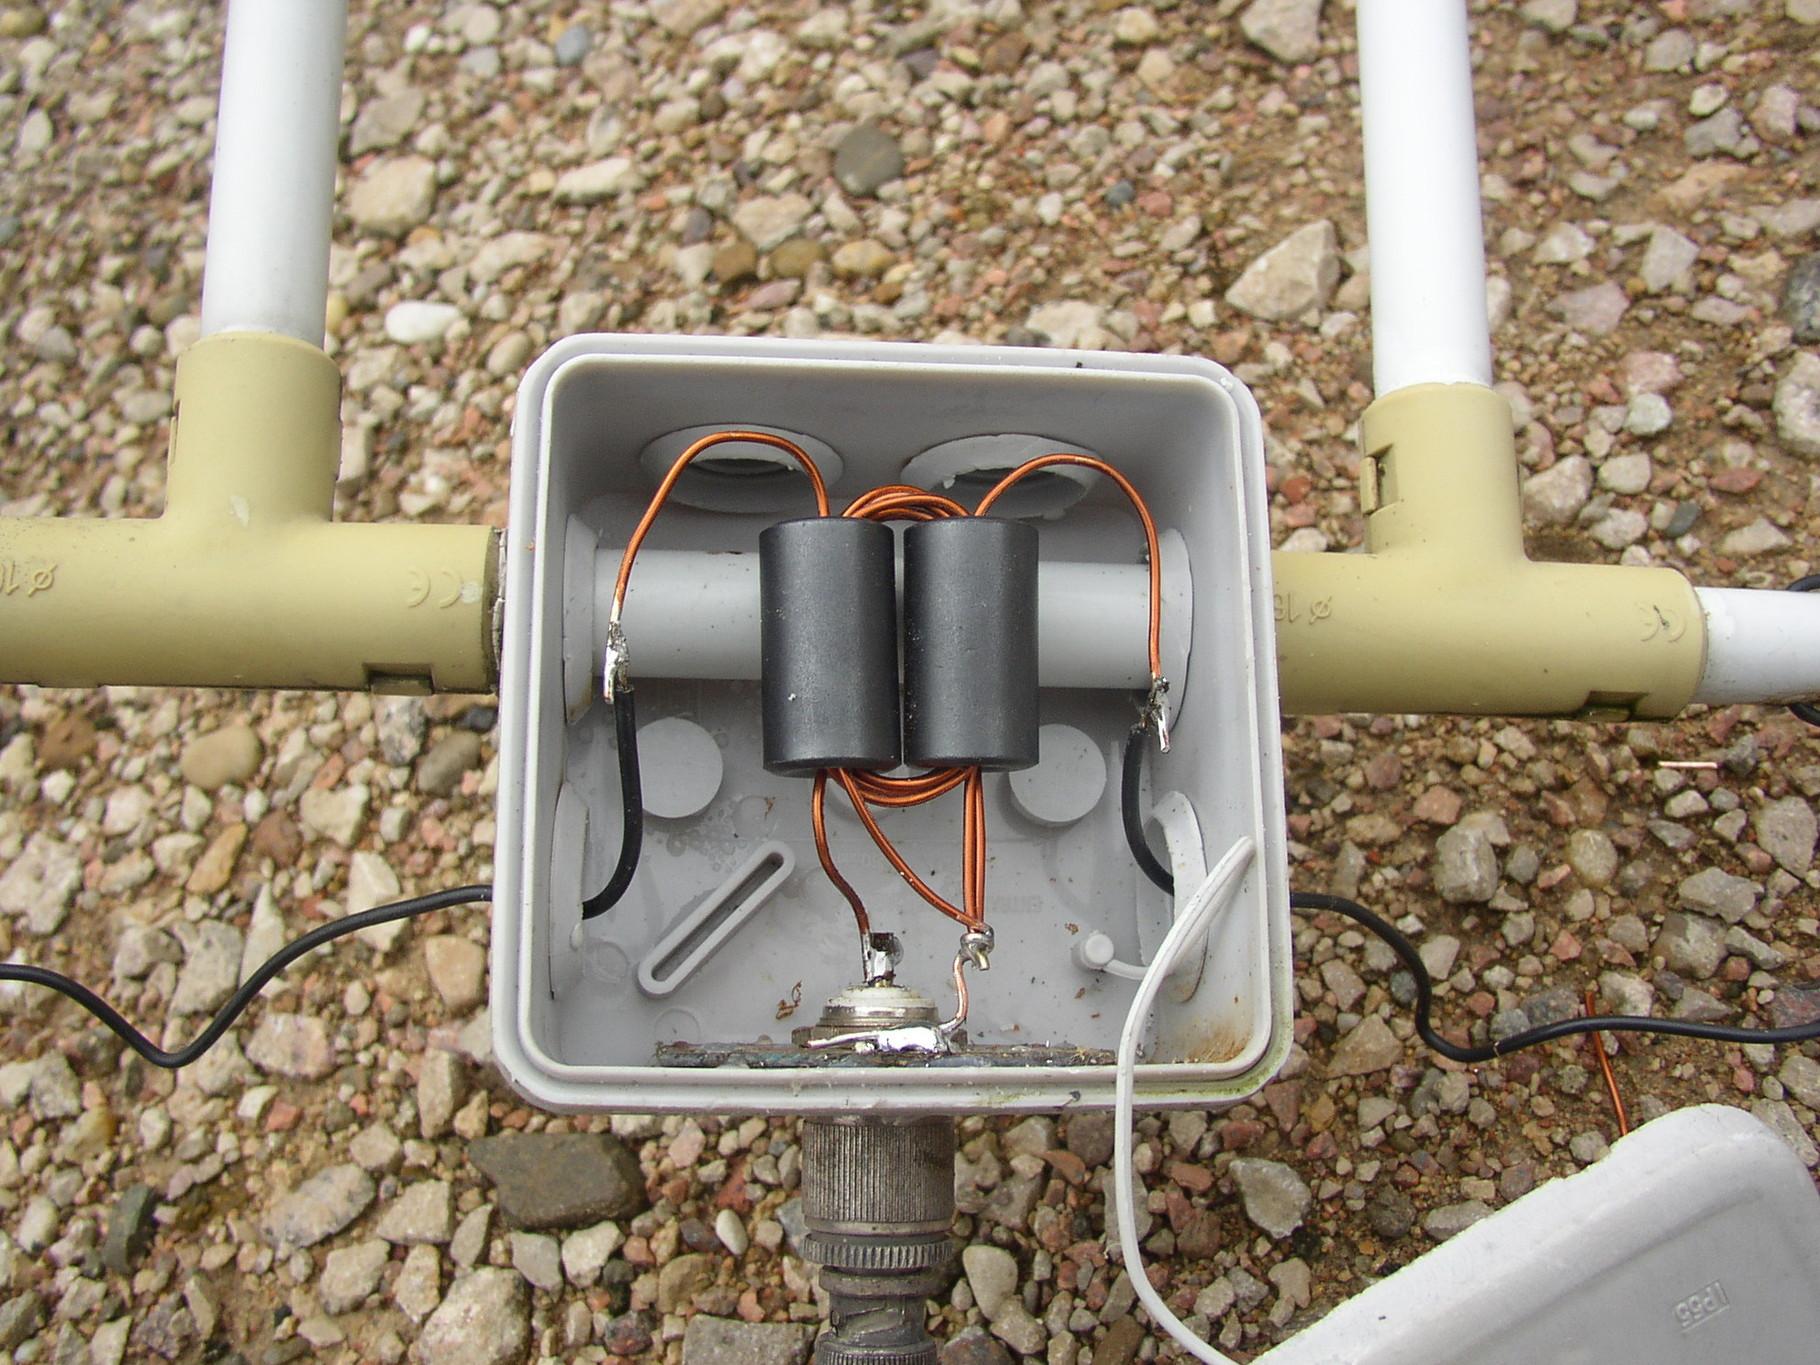 Magnetic Balun Un Un Antenne: Balun Con Ferrite Binoculare